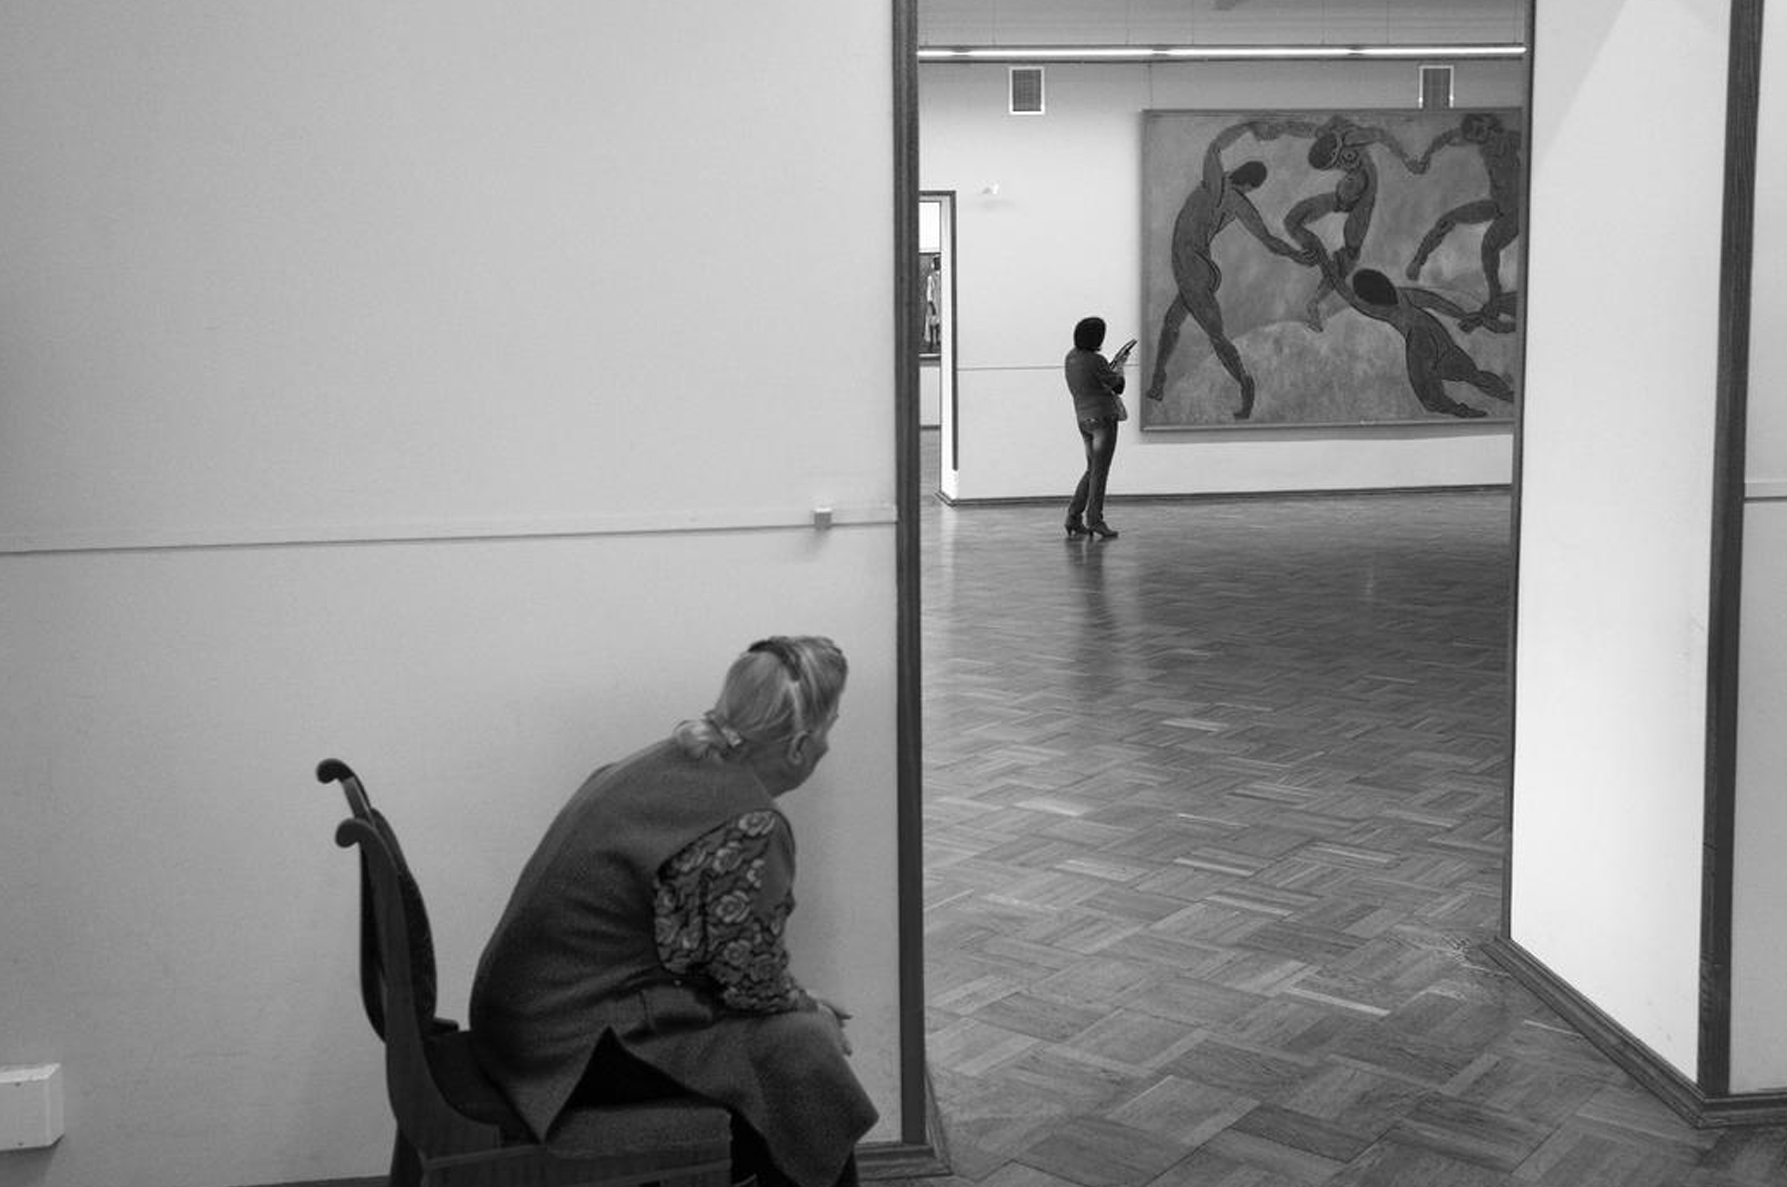 Стюарт Франклин. Матисс. Санкт-Петербург. Эрмитаж. 2010